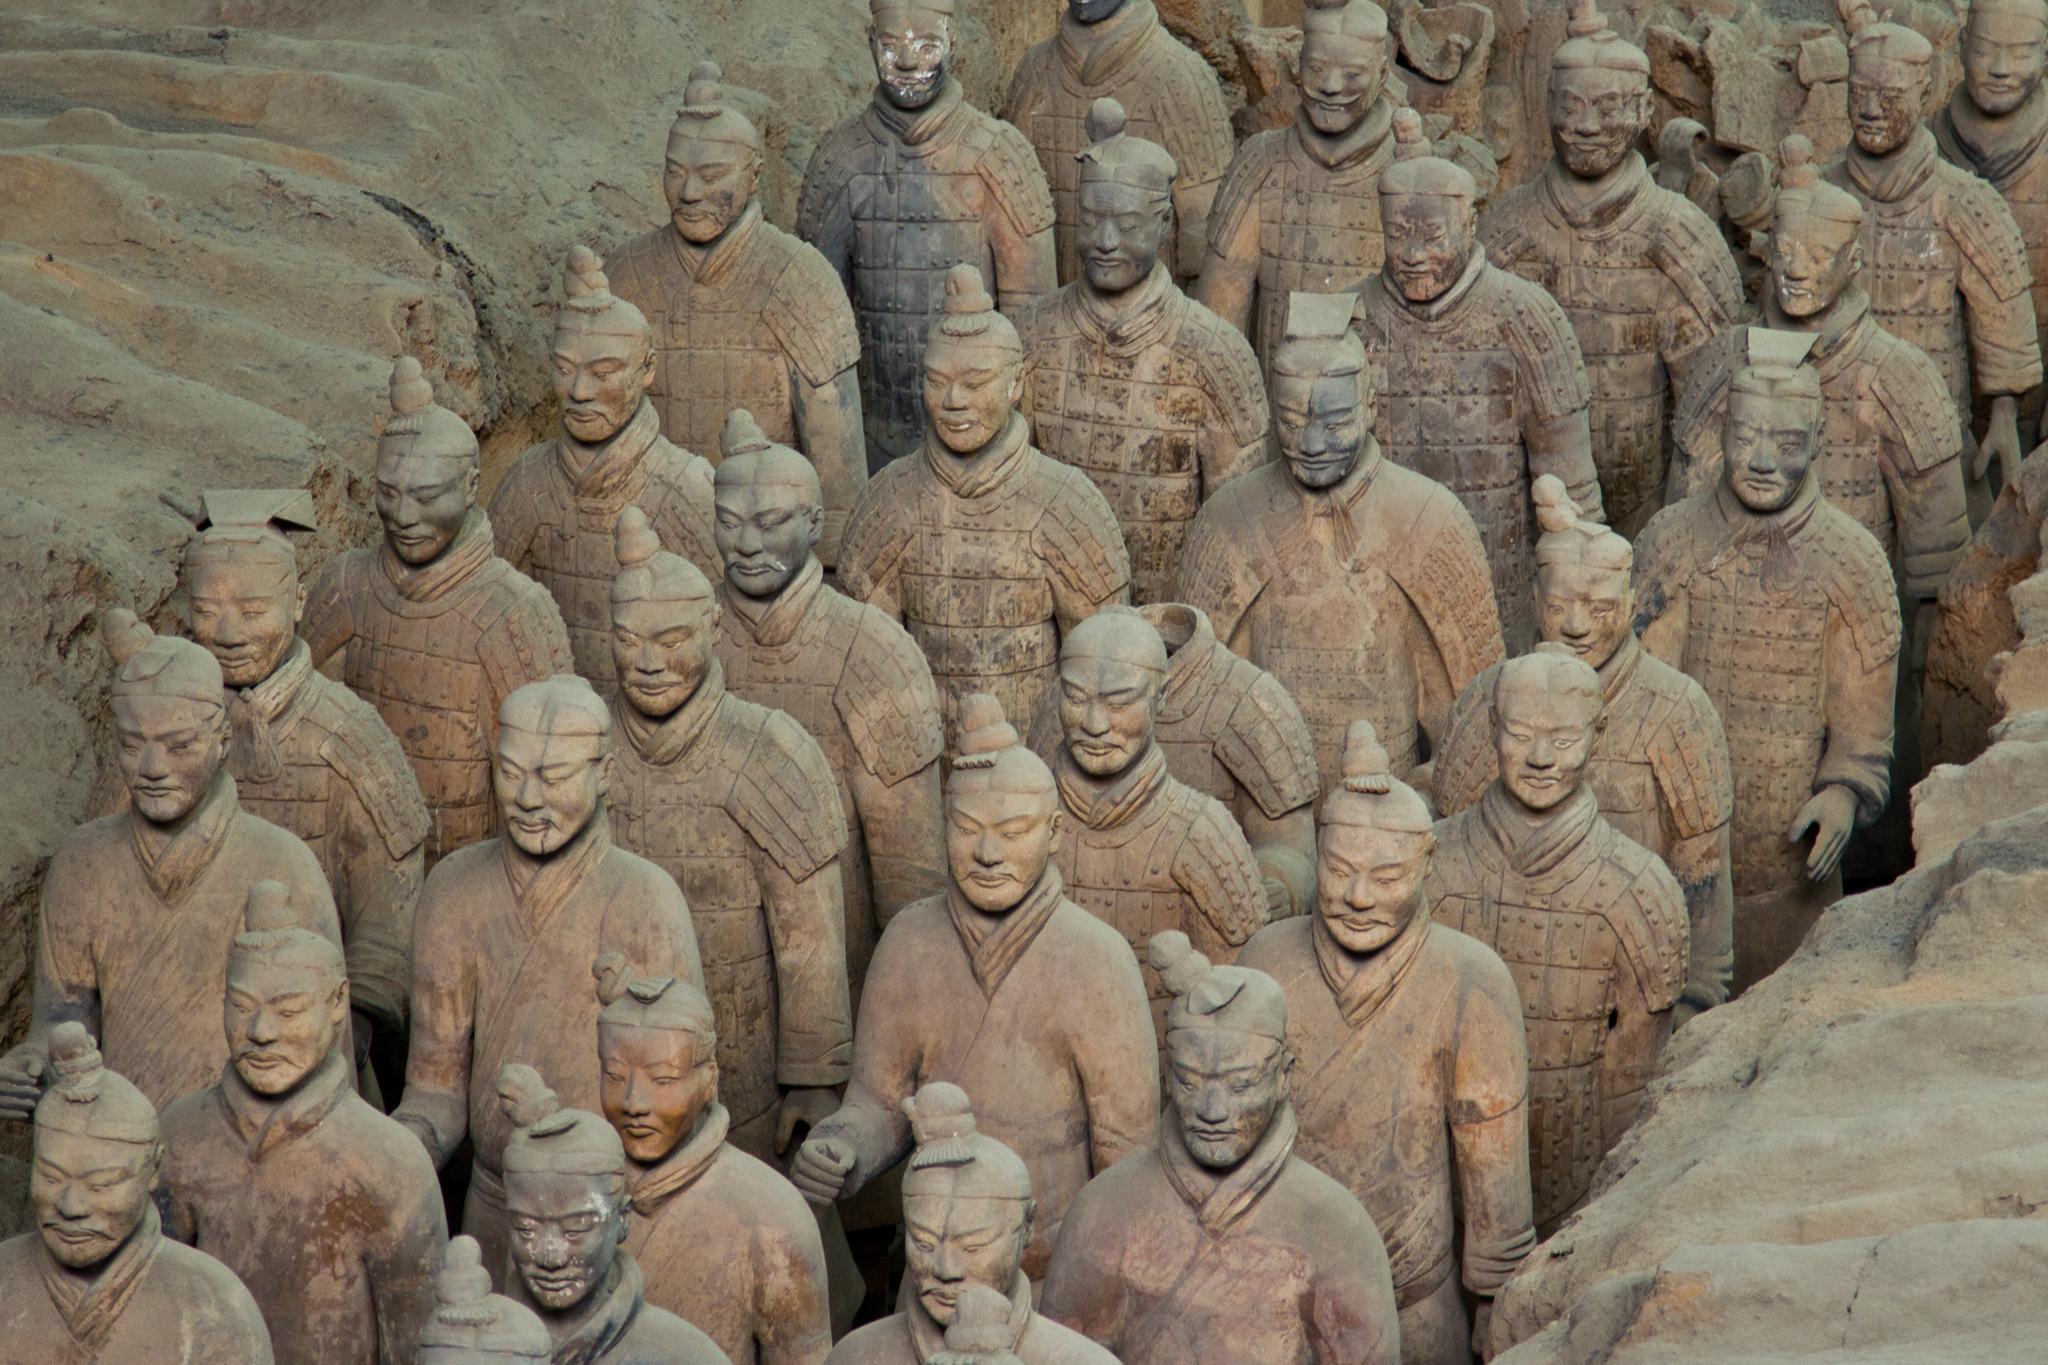 древний китай культура с картинками